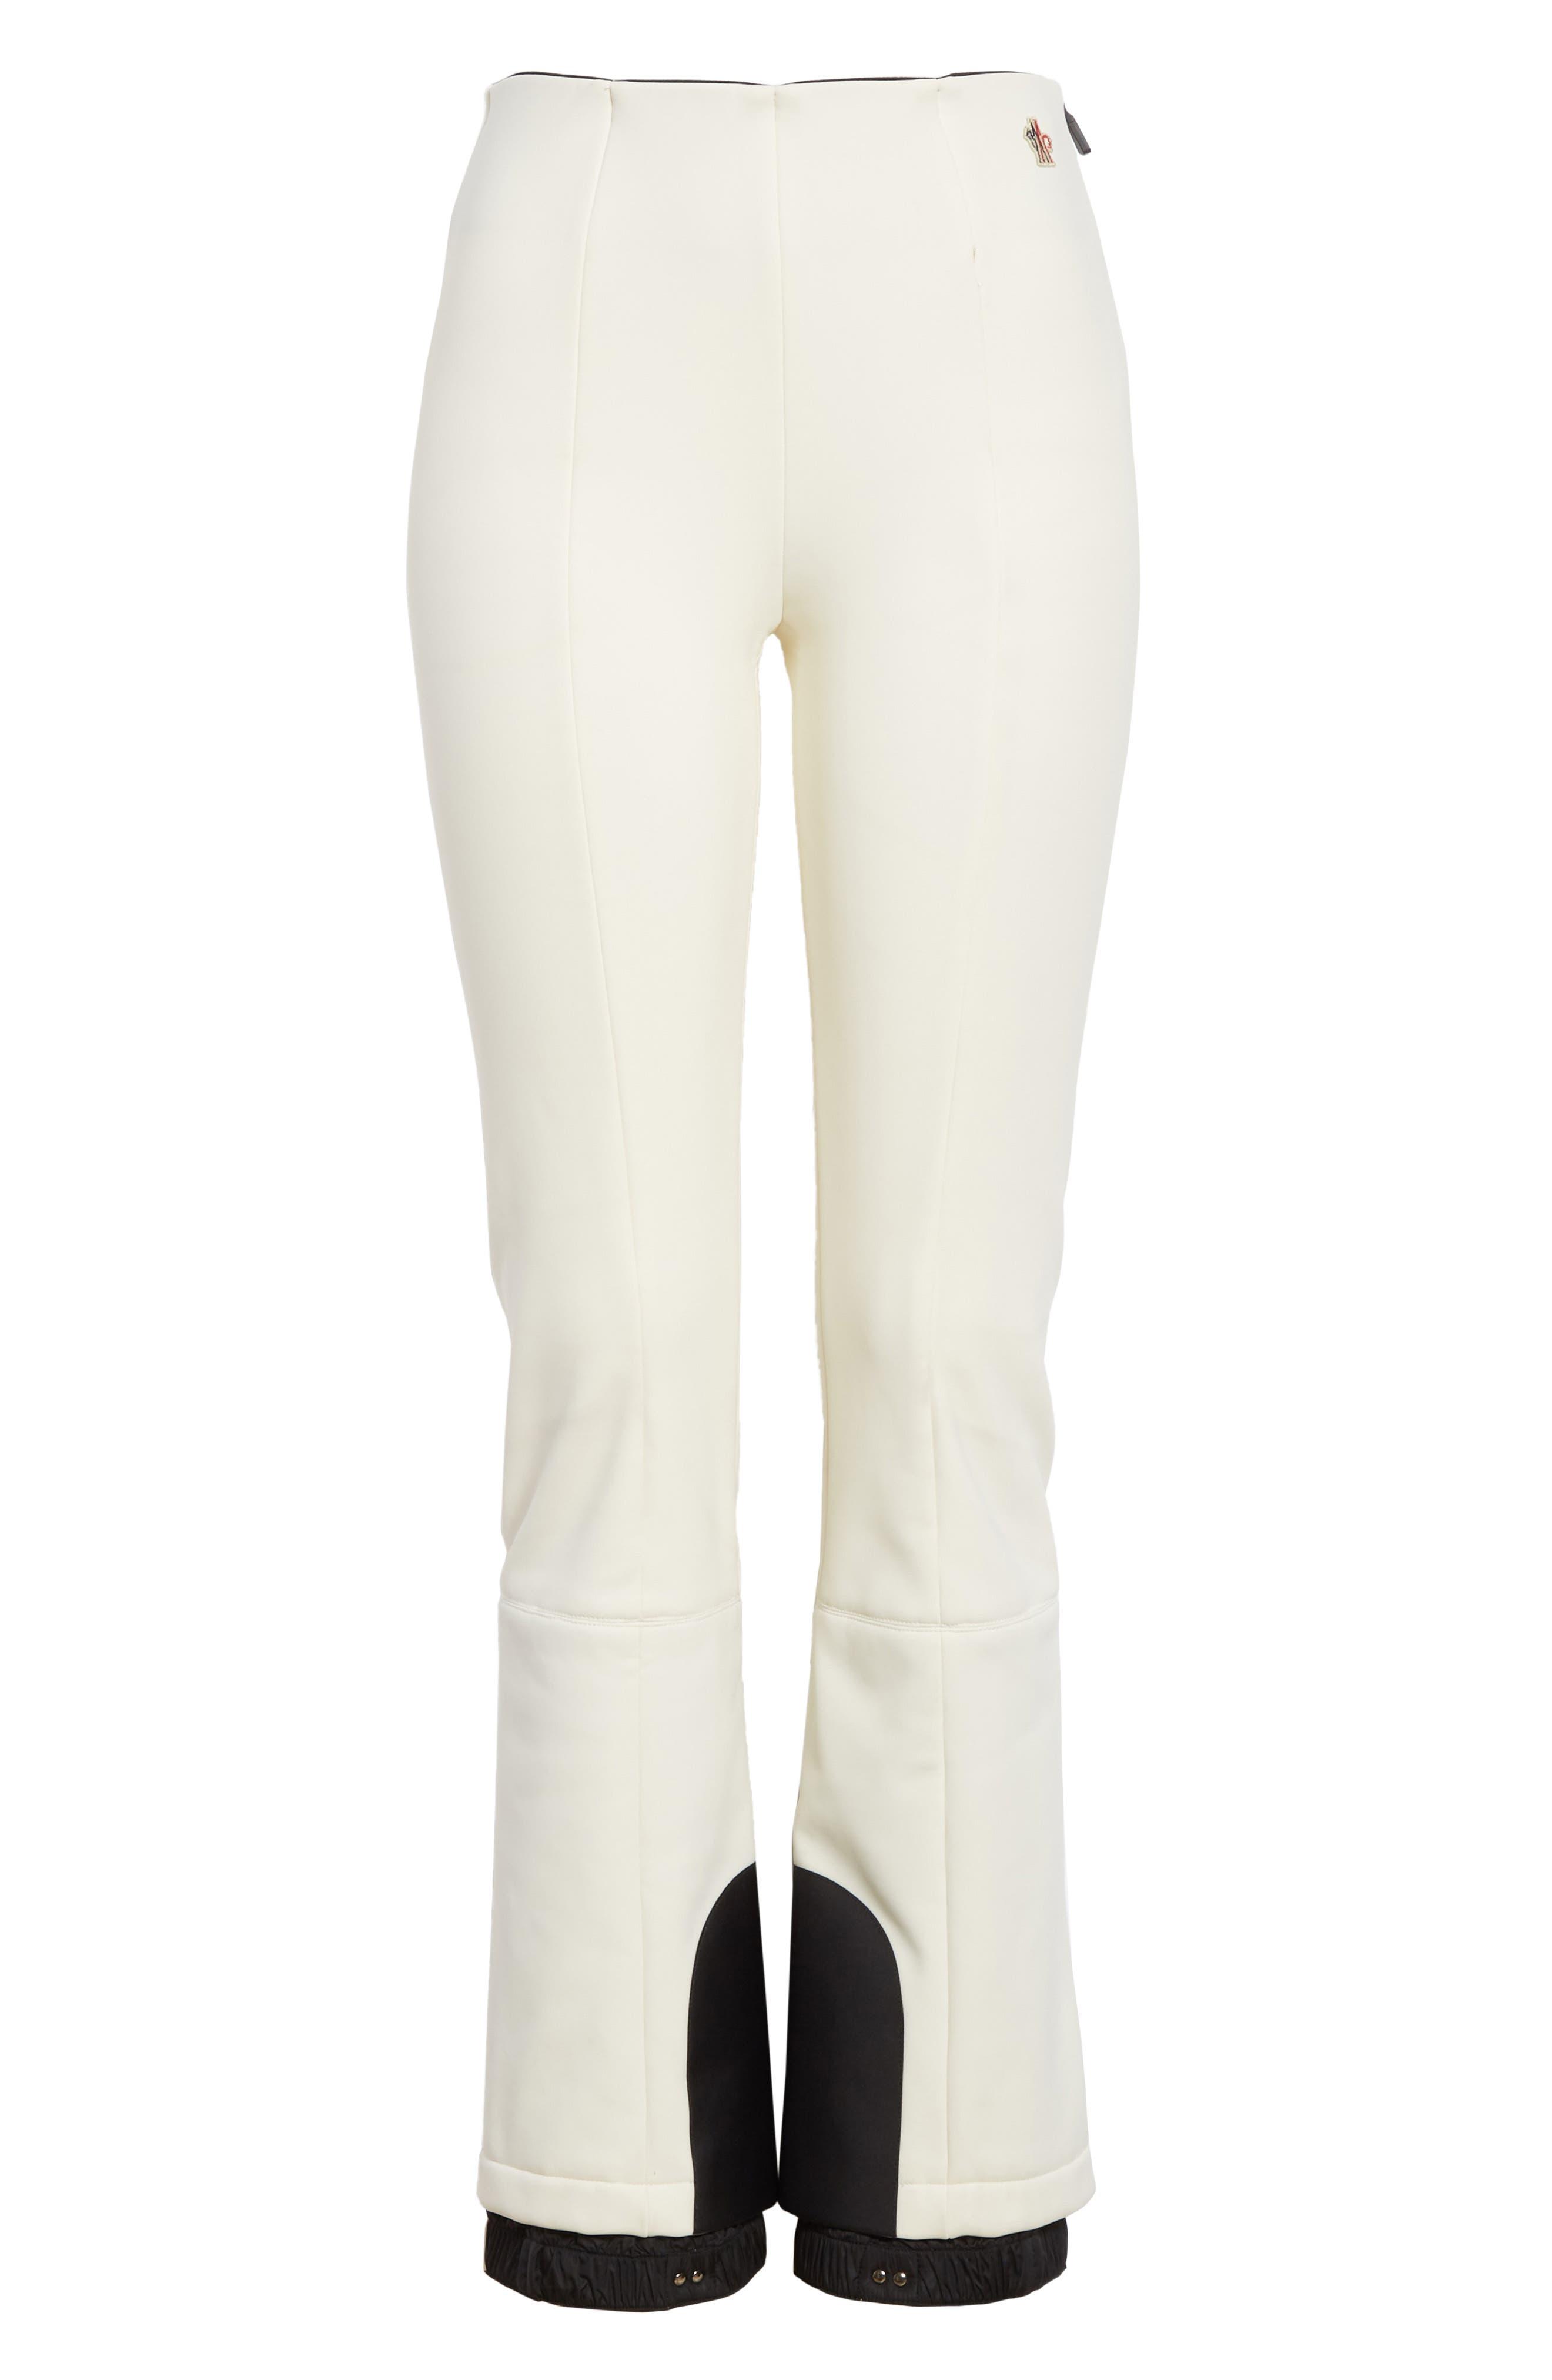 MONCLER, Skinny Stretch Ski Pants, Alternate thumbnail 6, color, WHITE